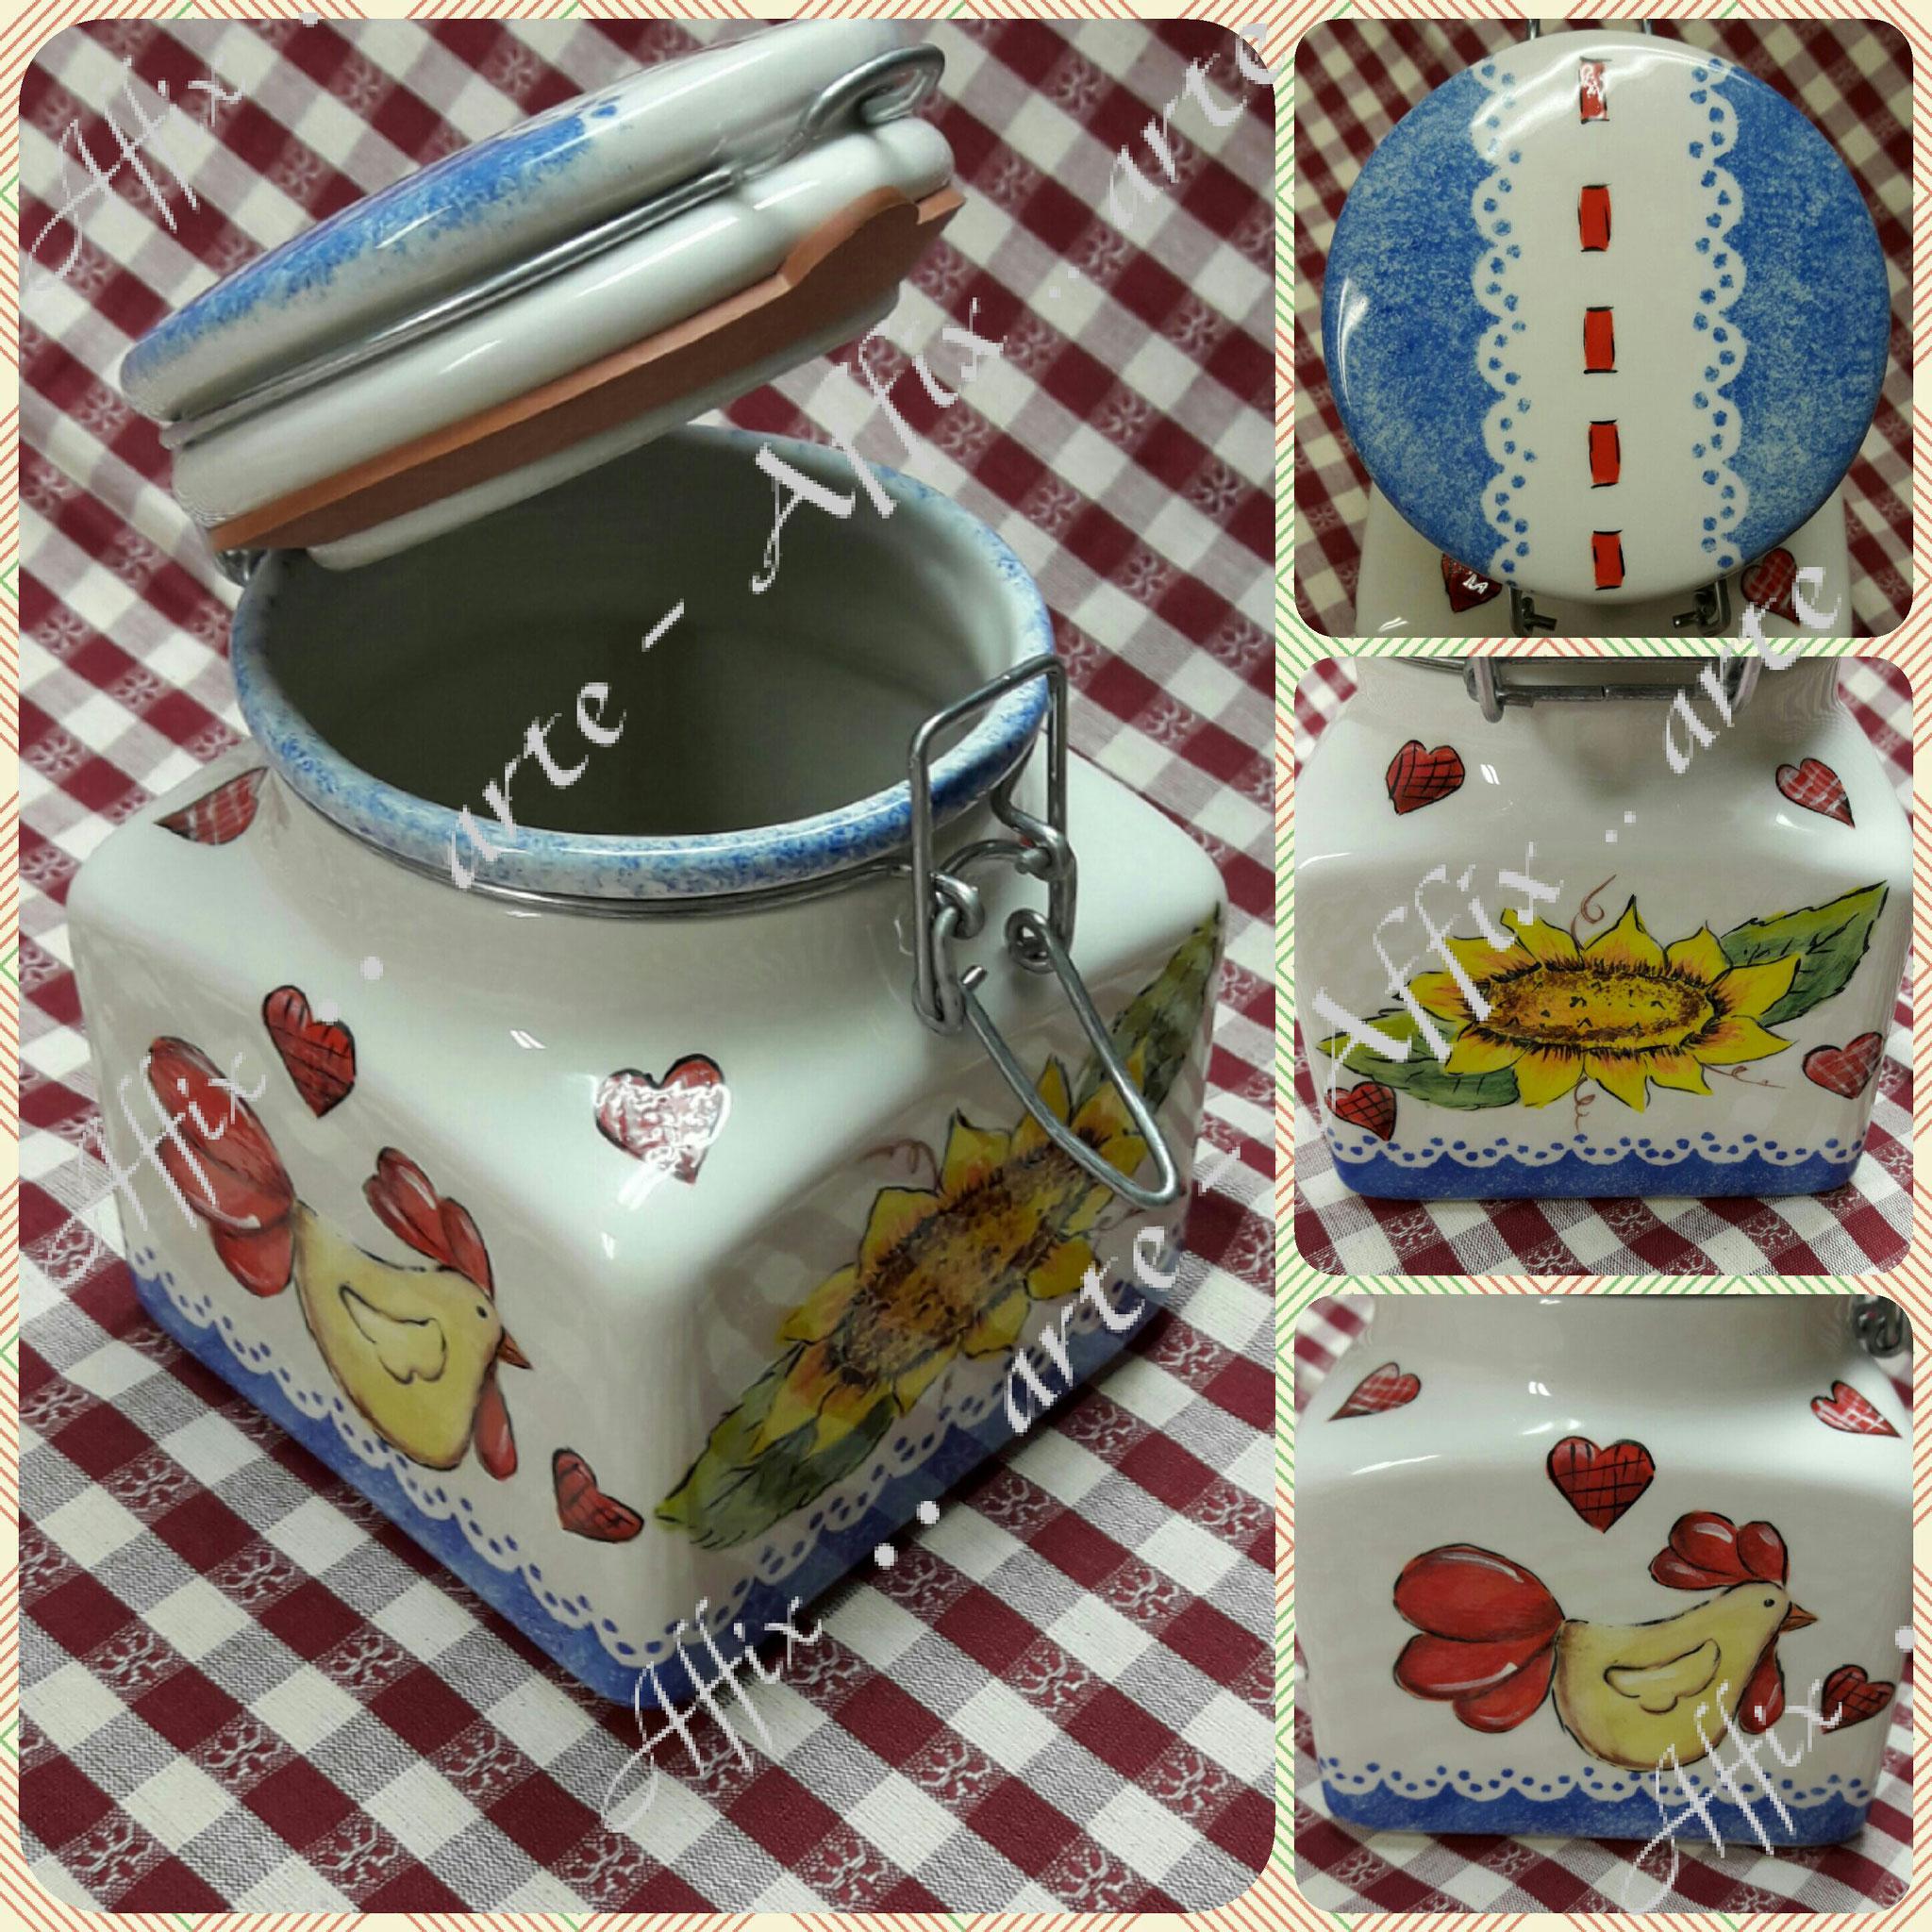 Barattoli cucina - Benvenuti su Sabry Art and Craft!